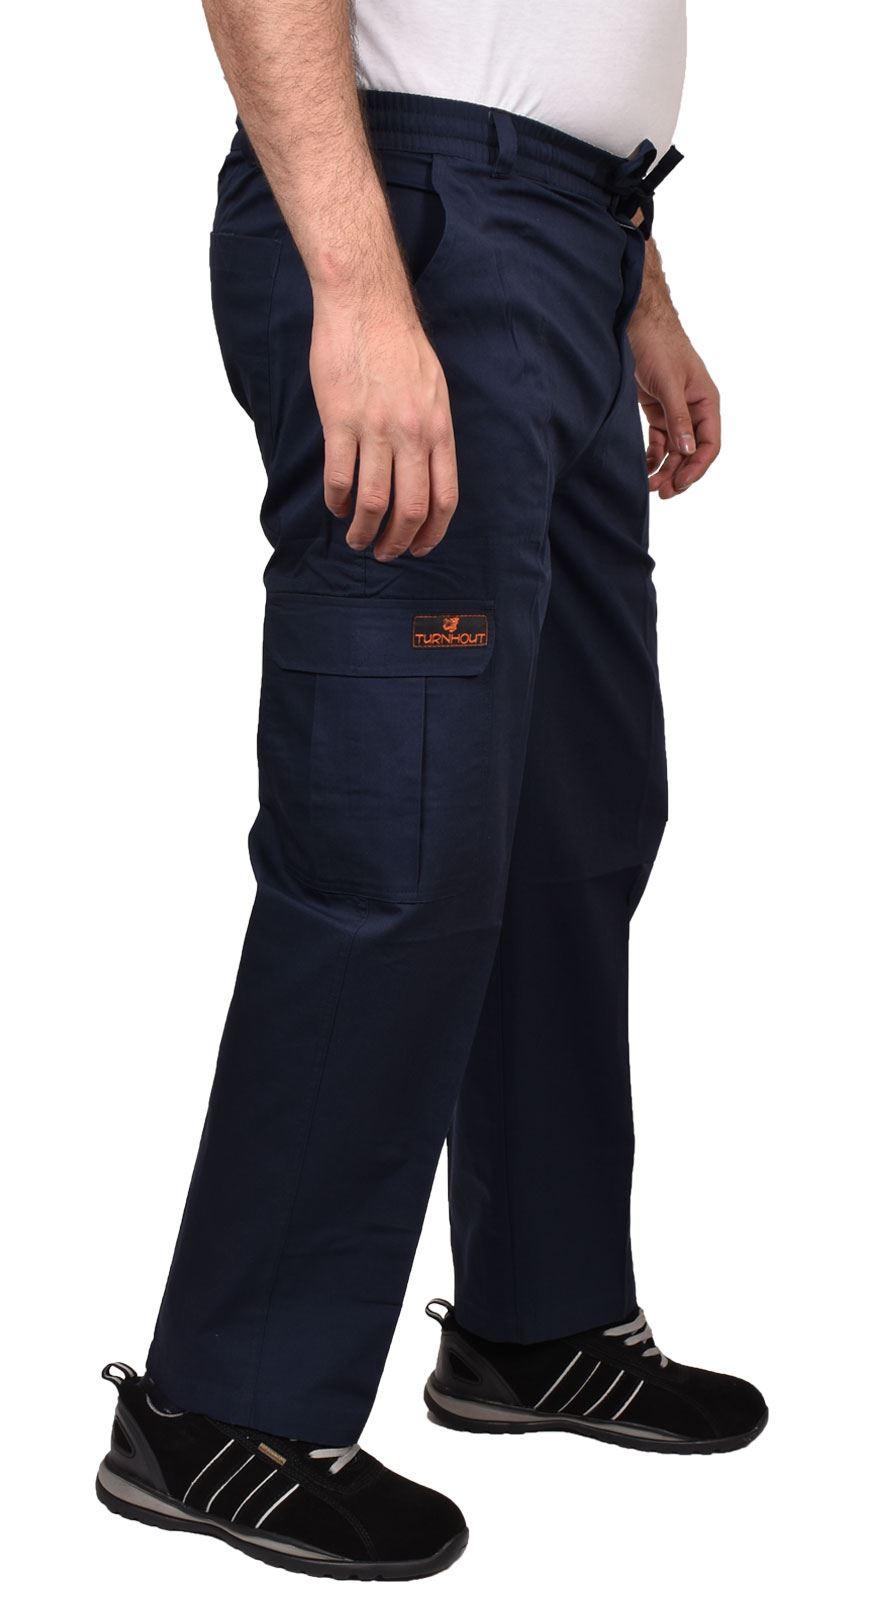 Para-Hombre-De-Carga-Combate-Pantalones-De-Trabajo-Bolsillos-Patrulla-Tactico-Pro-Algodon-Pantalones miniatura 13